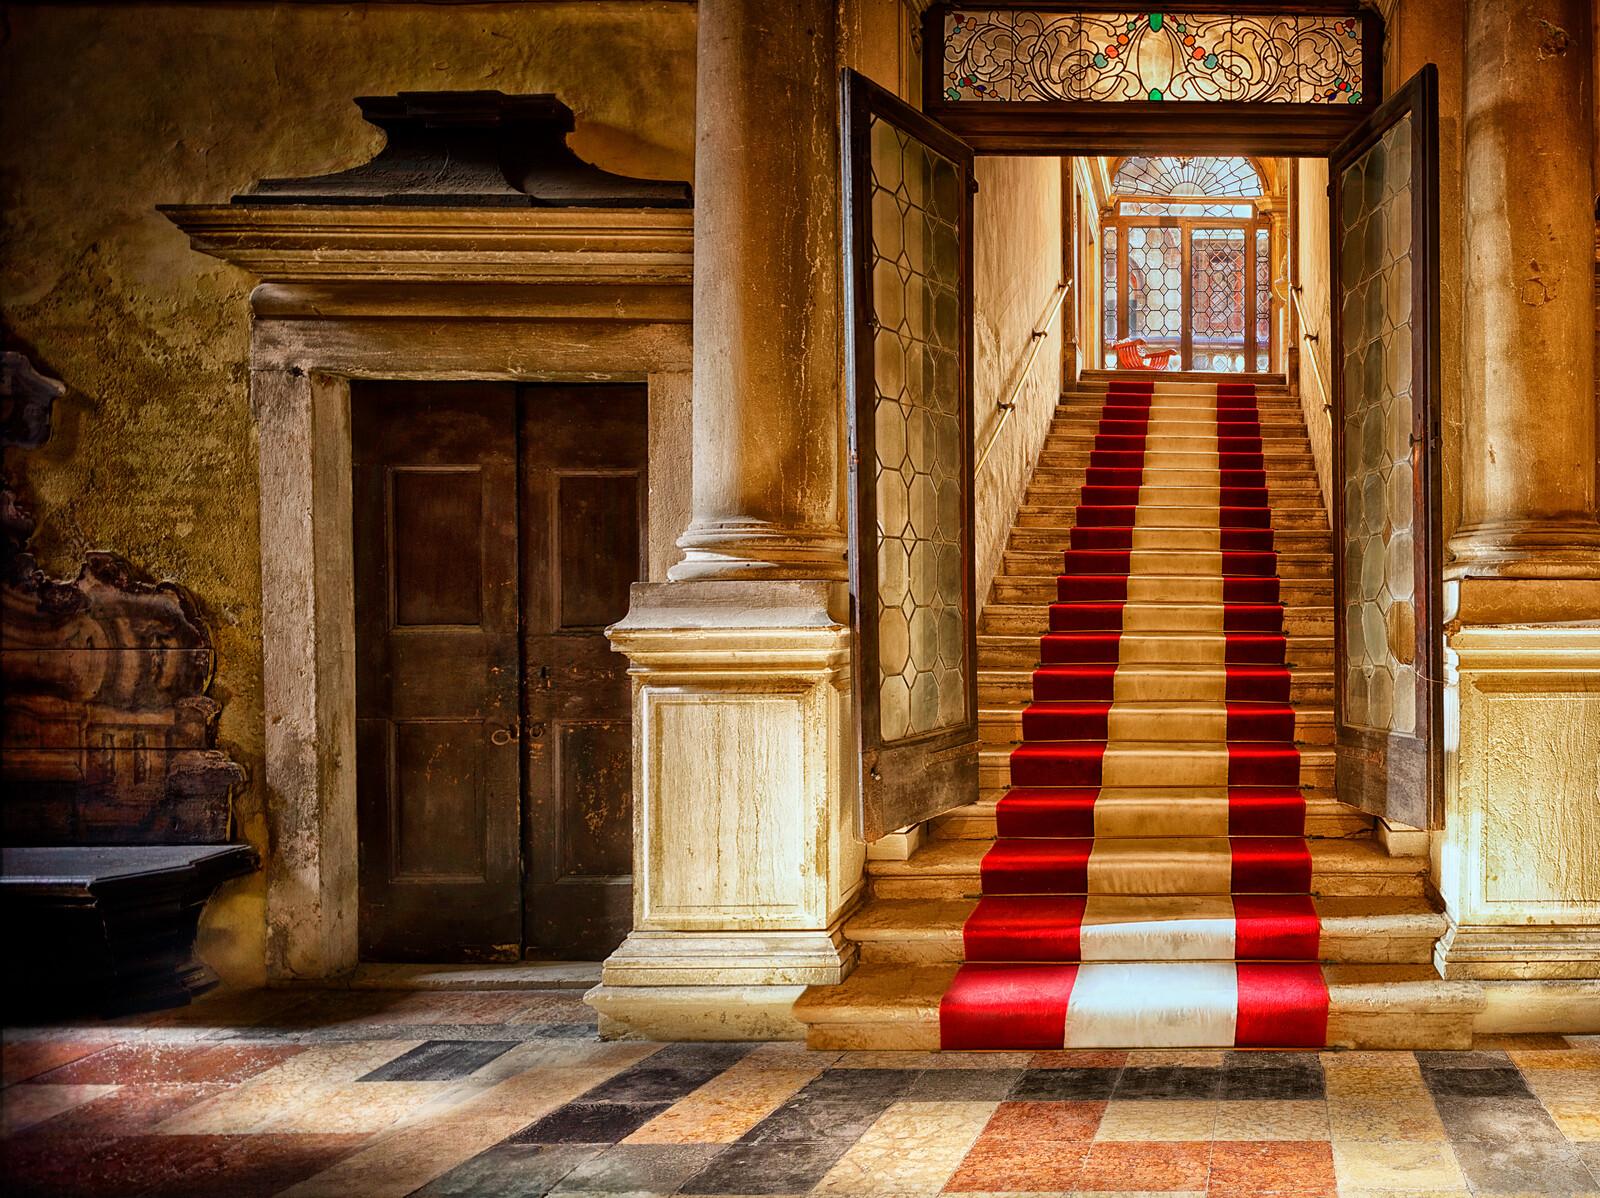 Palazzo di Alvise I - Werner Pawlok